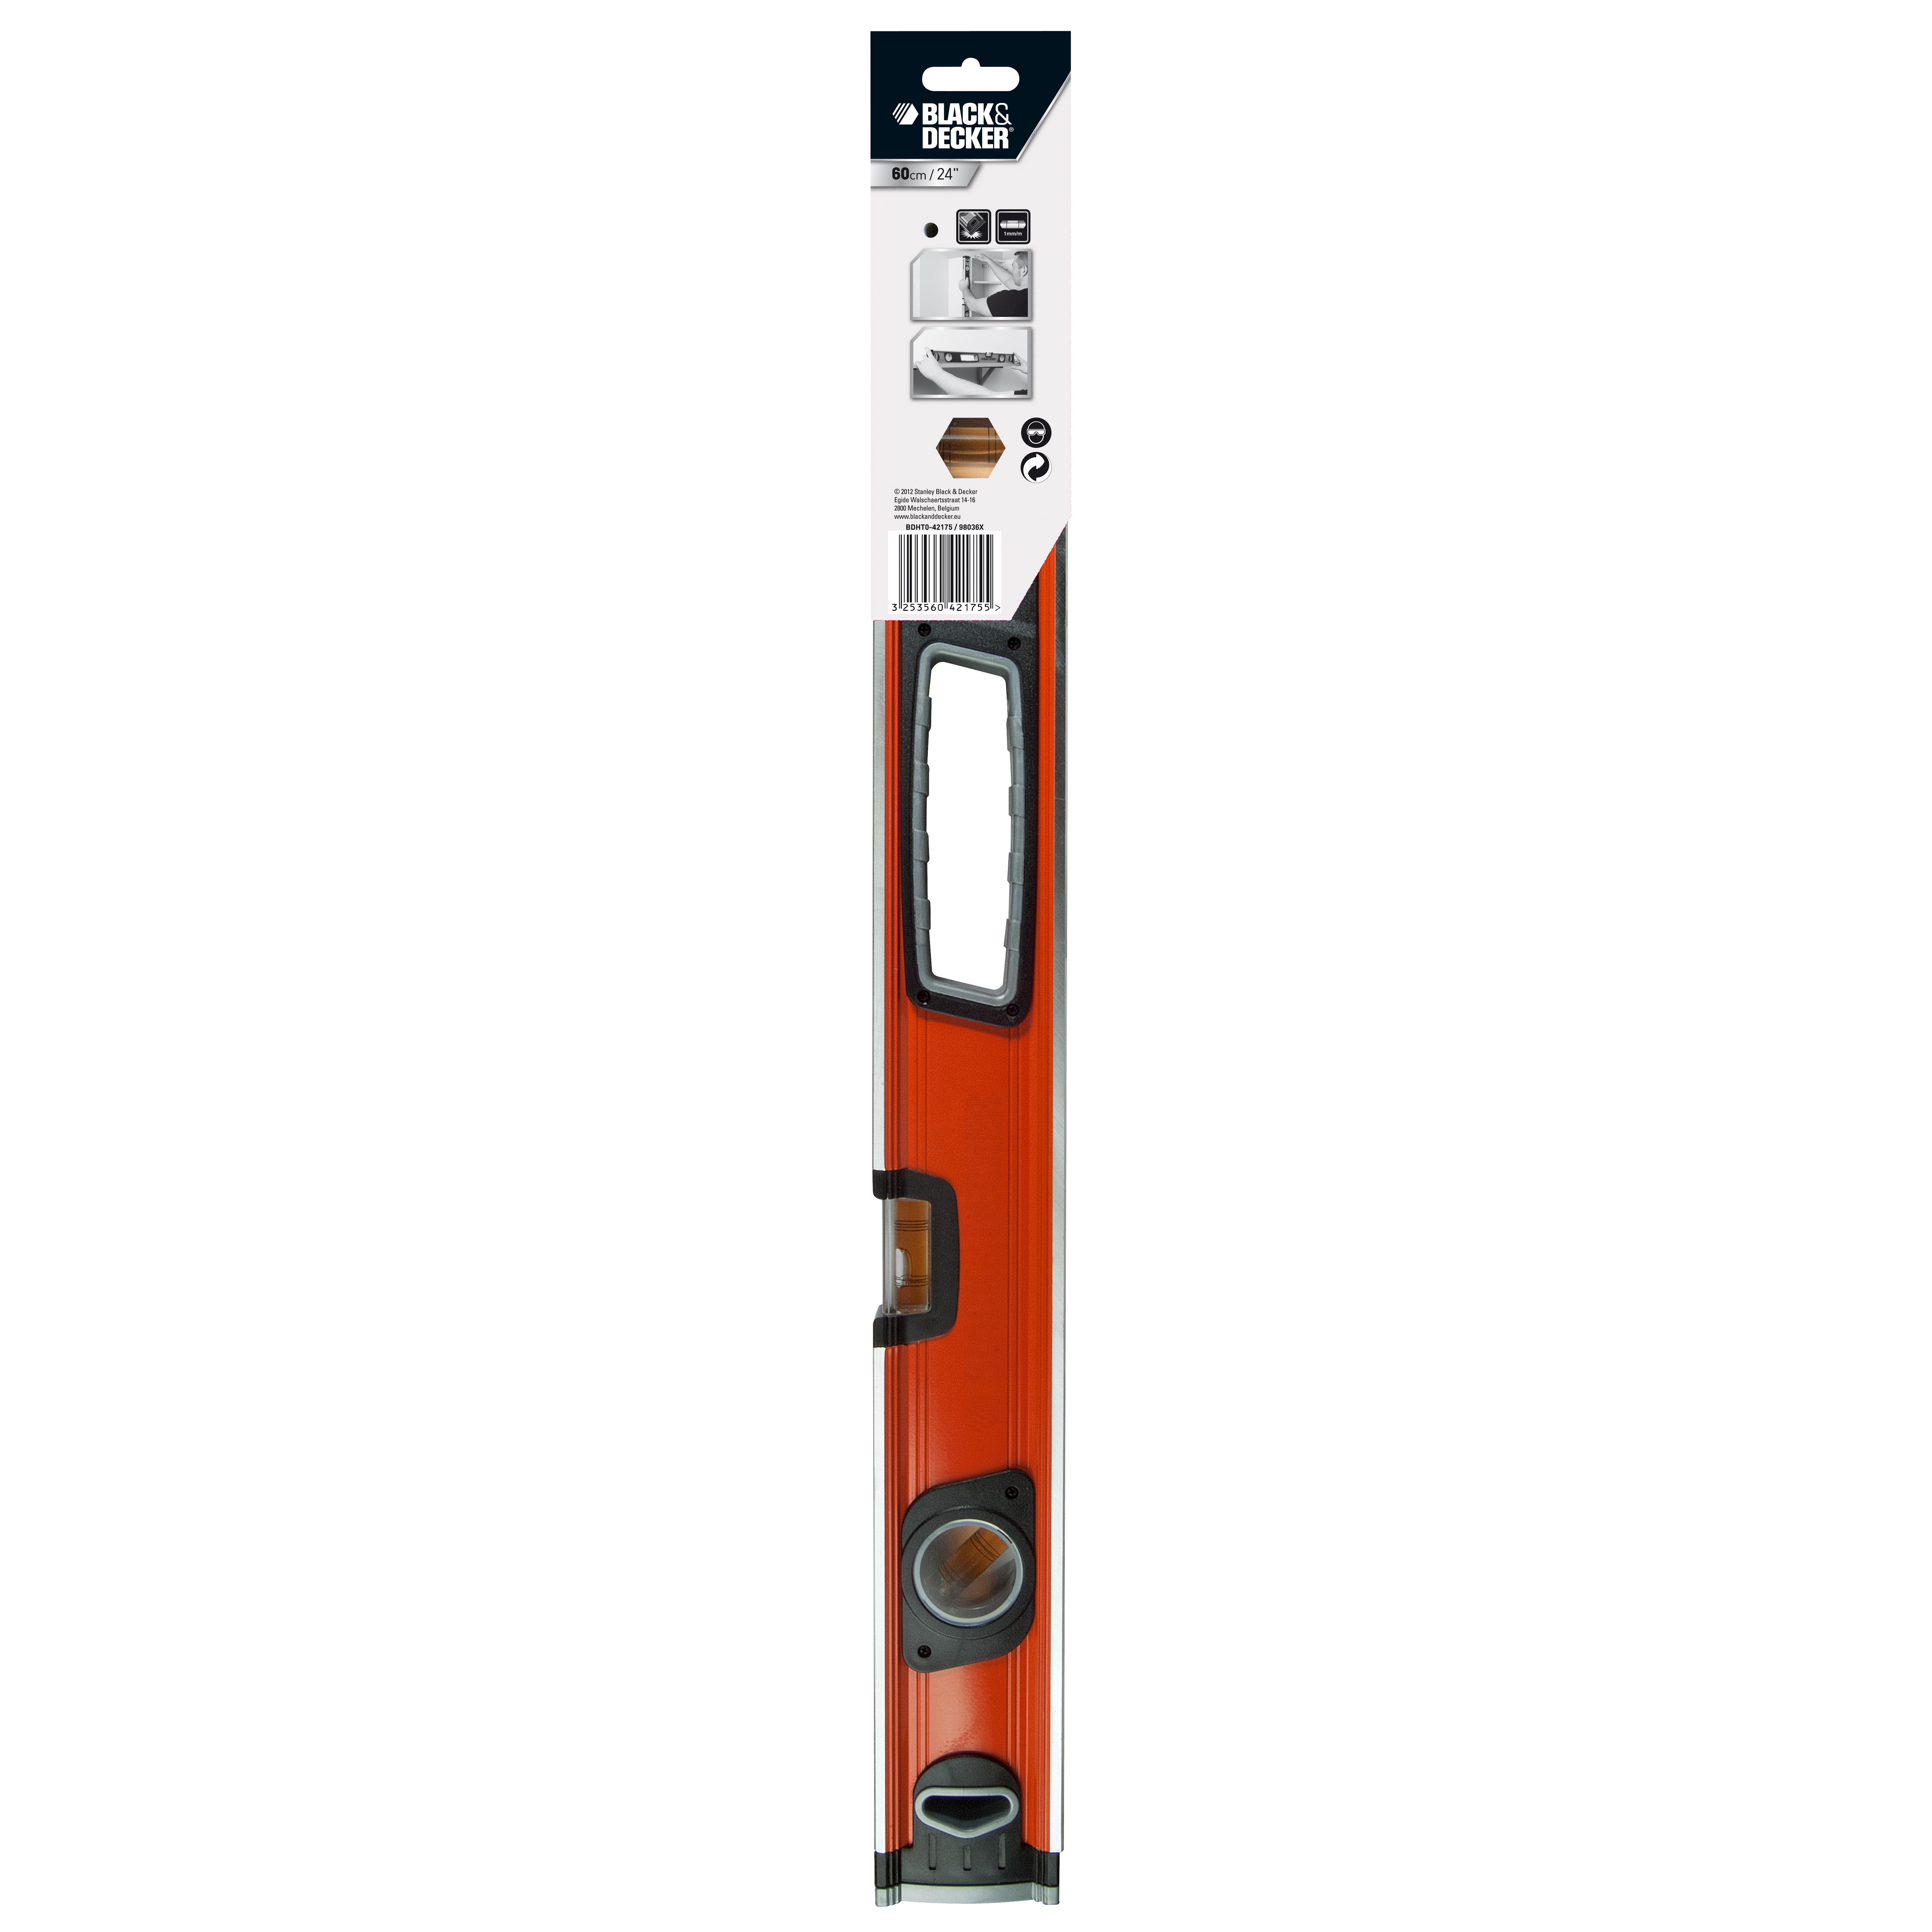 Black + Decker COMBO-3945 Box Level, 60 cm, 24 Inches, Set of 2 Thumbnail 9